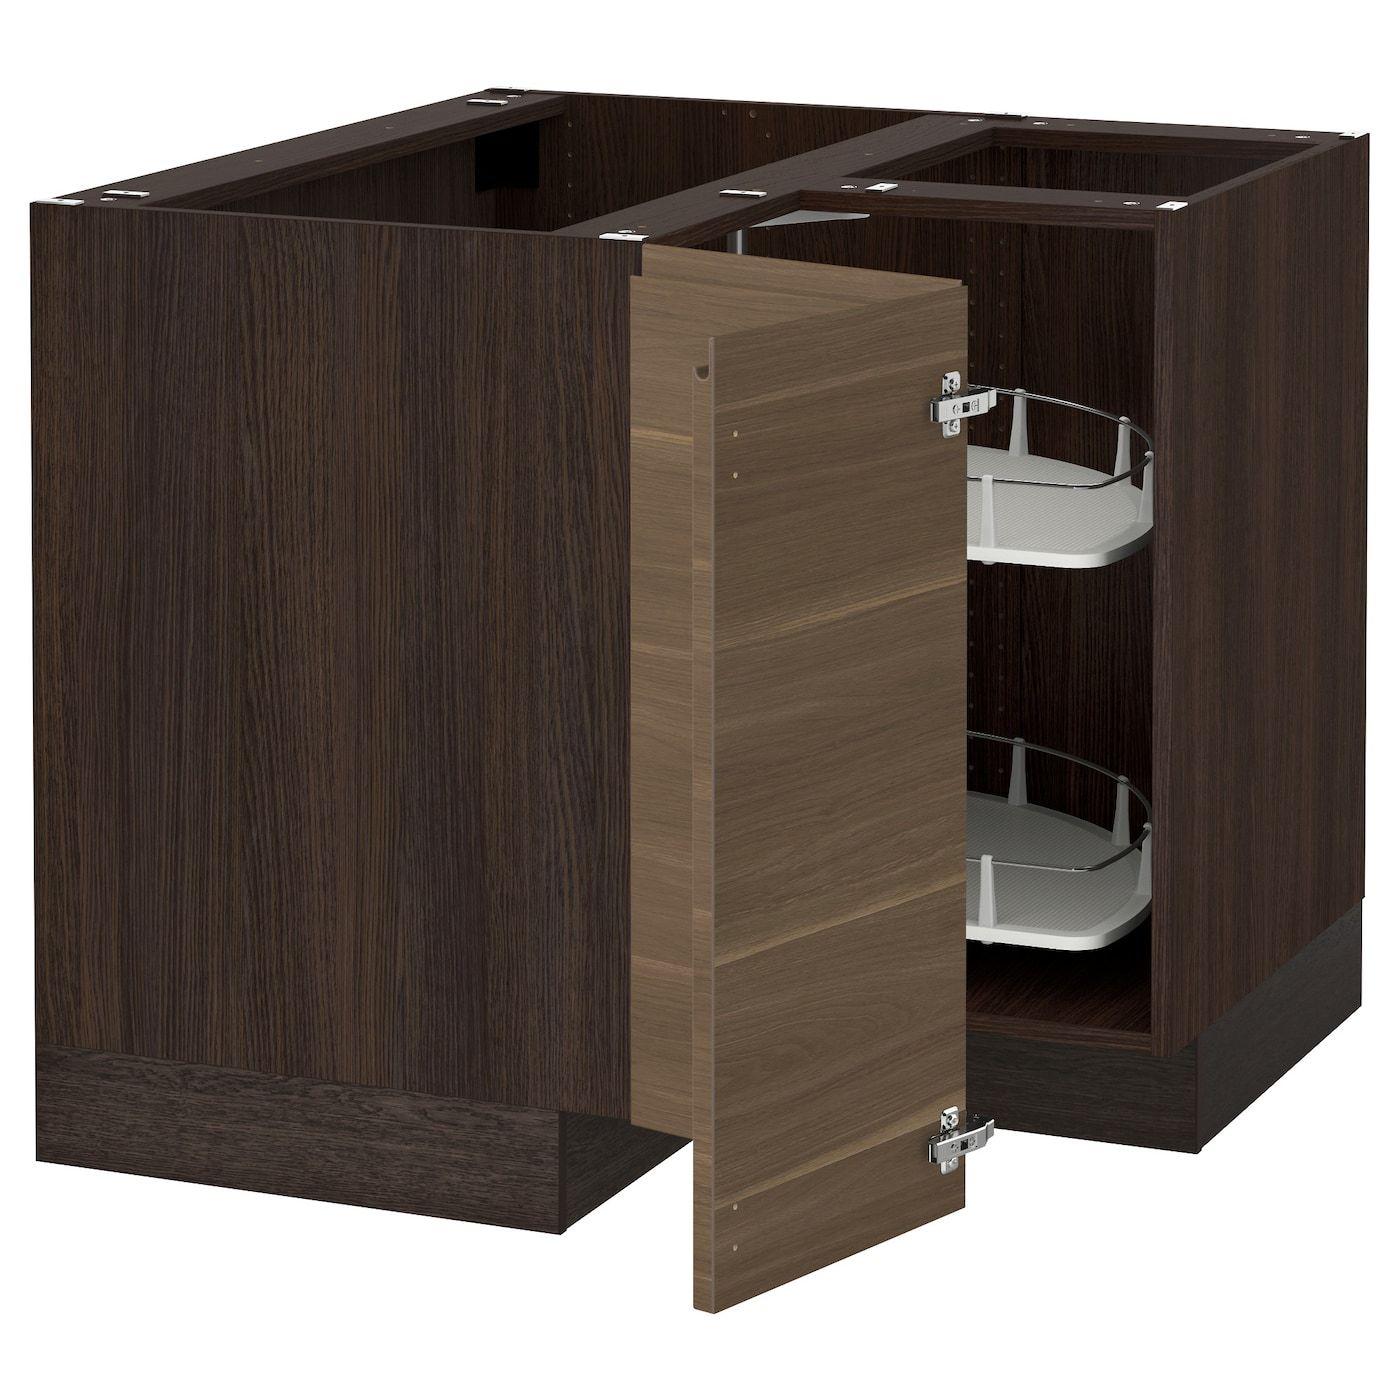 Best Ikea Sektion Wood Effect Brown Corner Base Cabinet With 400 x 300